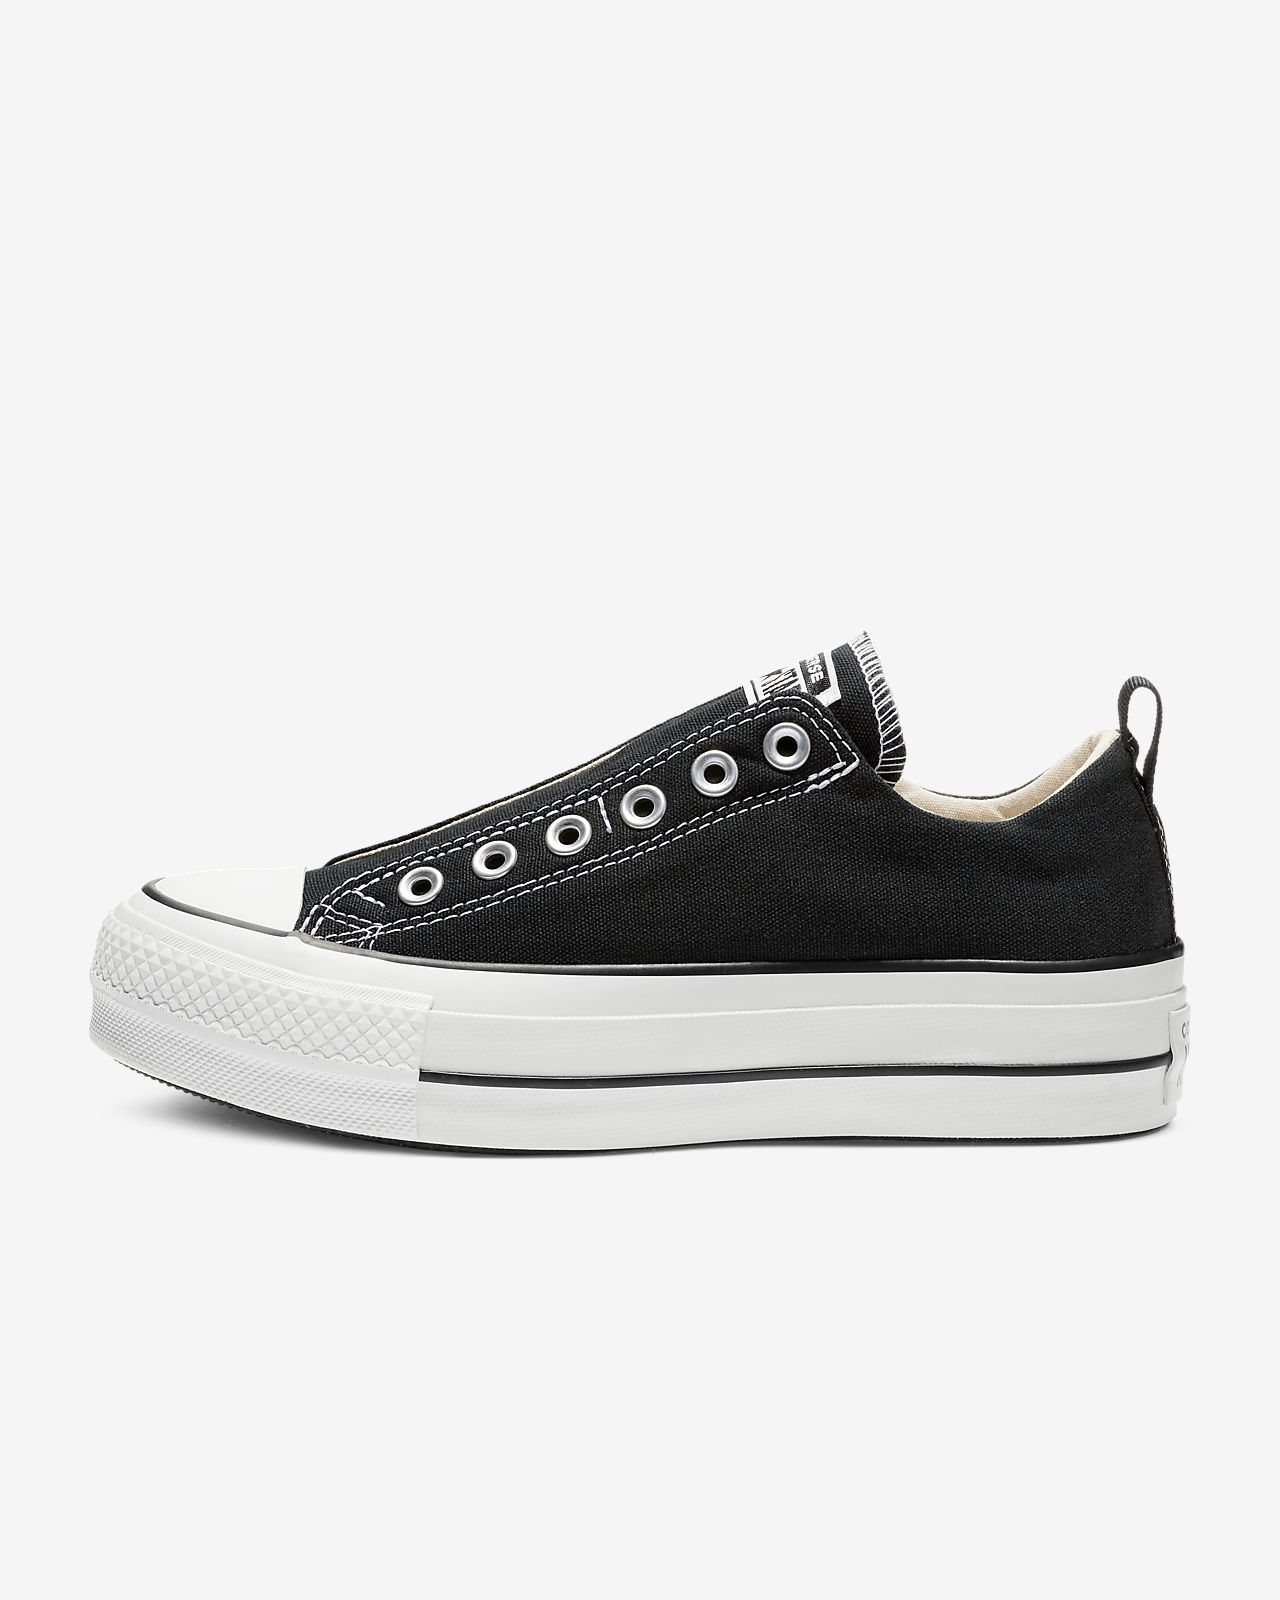 Chuck Taylor All Star Lift Slip Womens Shoe